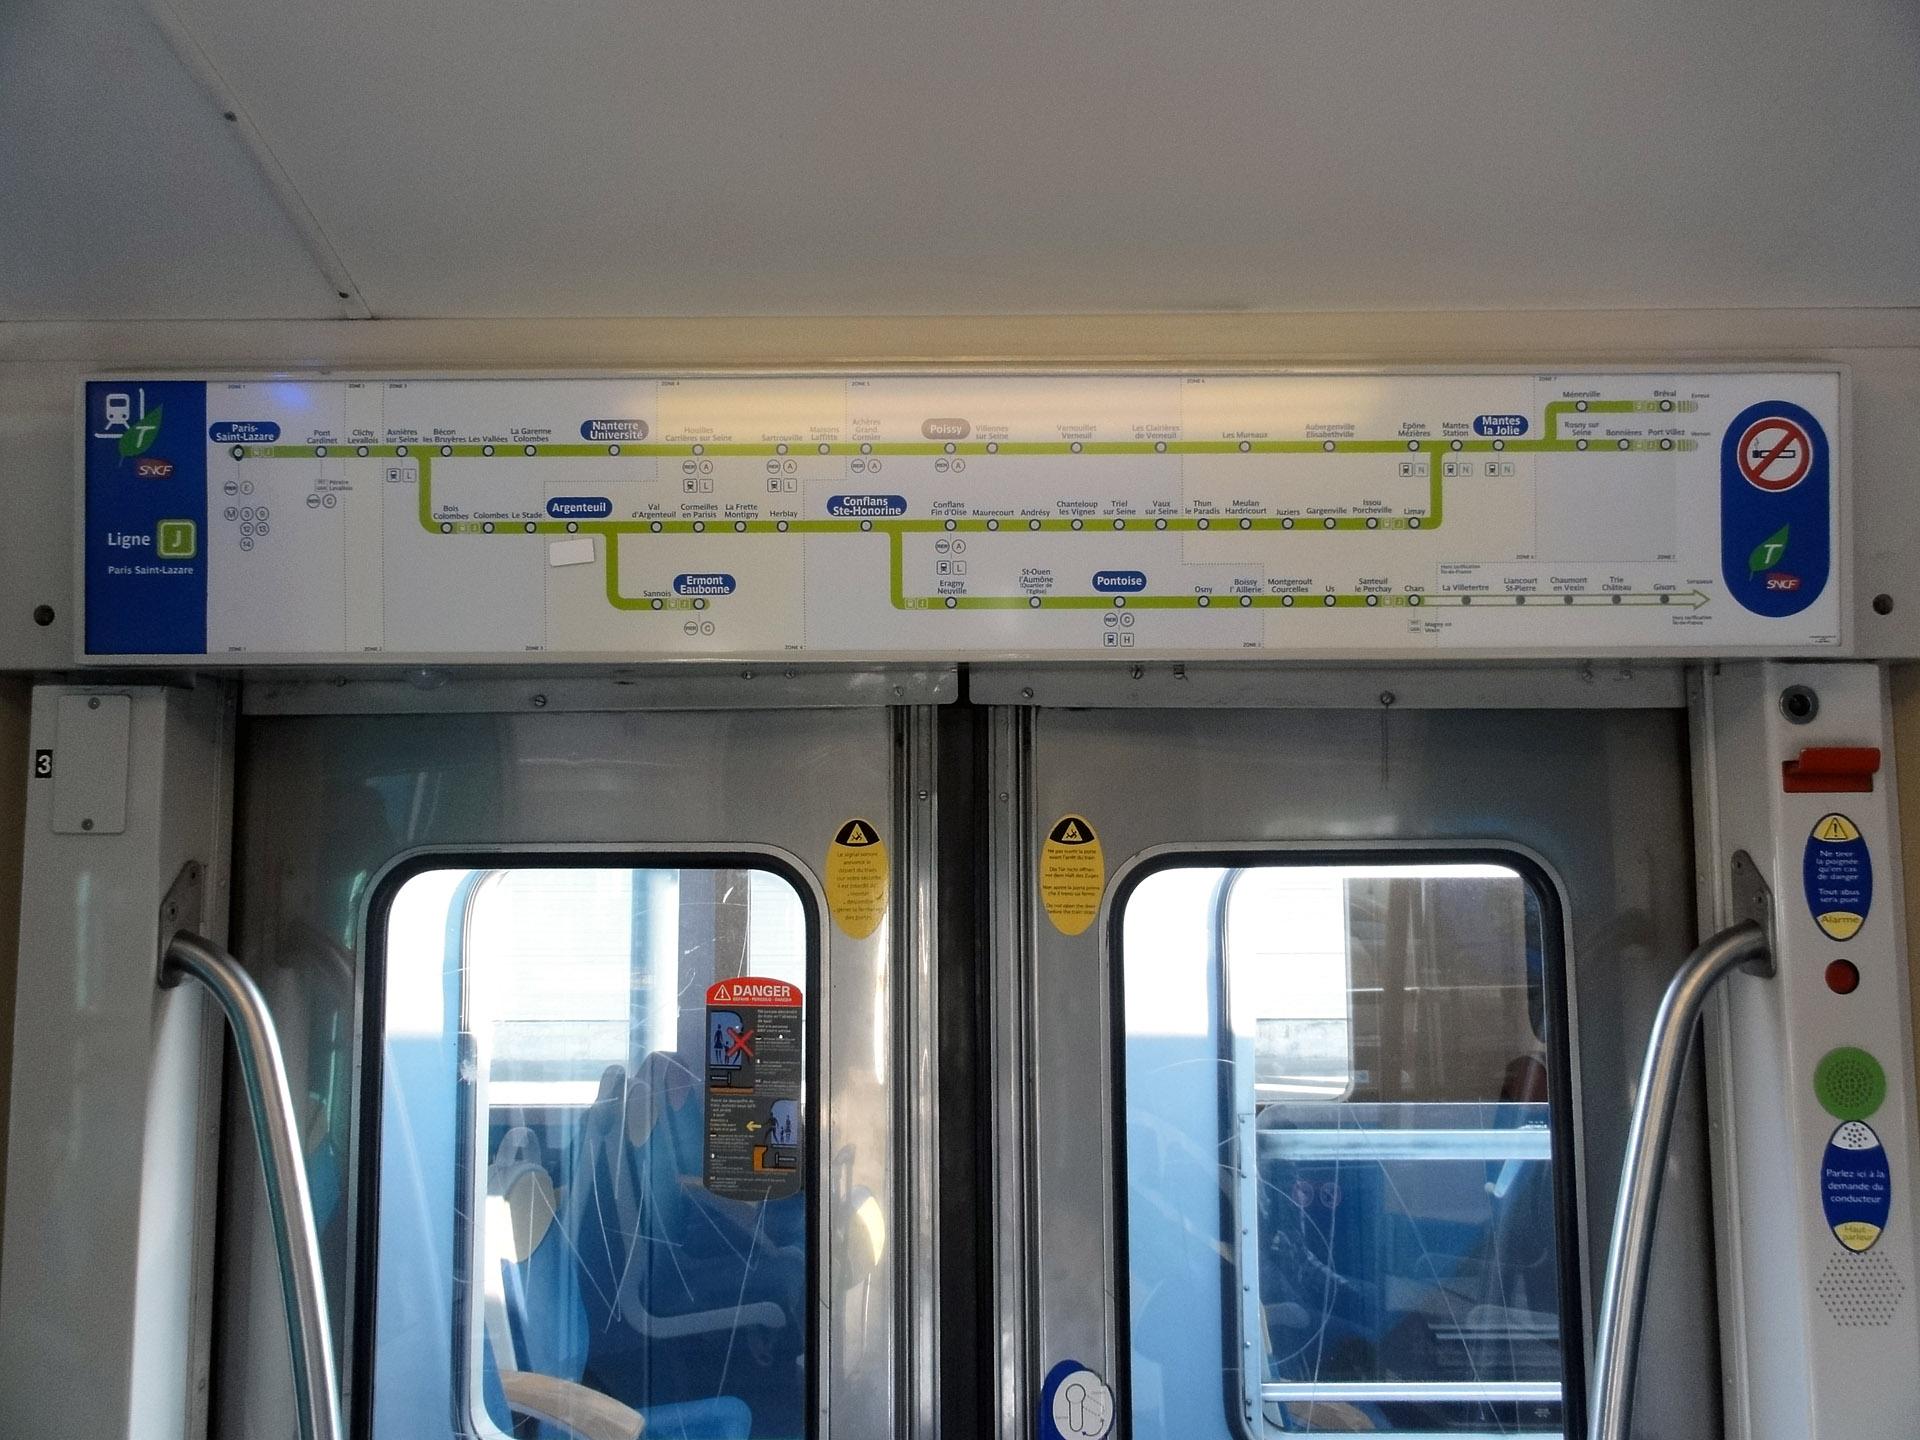 Fichier rame inox de banlieue plan de la ligne j du wikip dia - Transilien prochain train ...